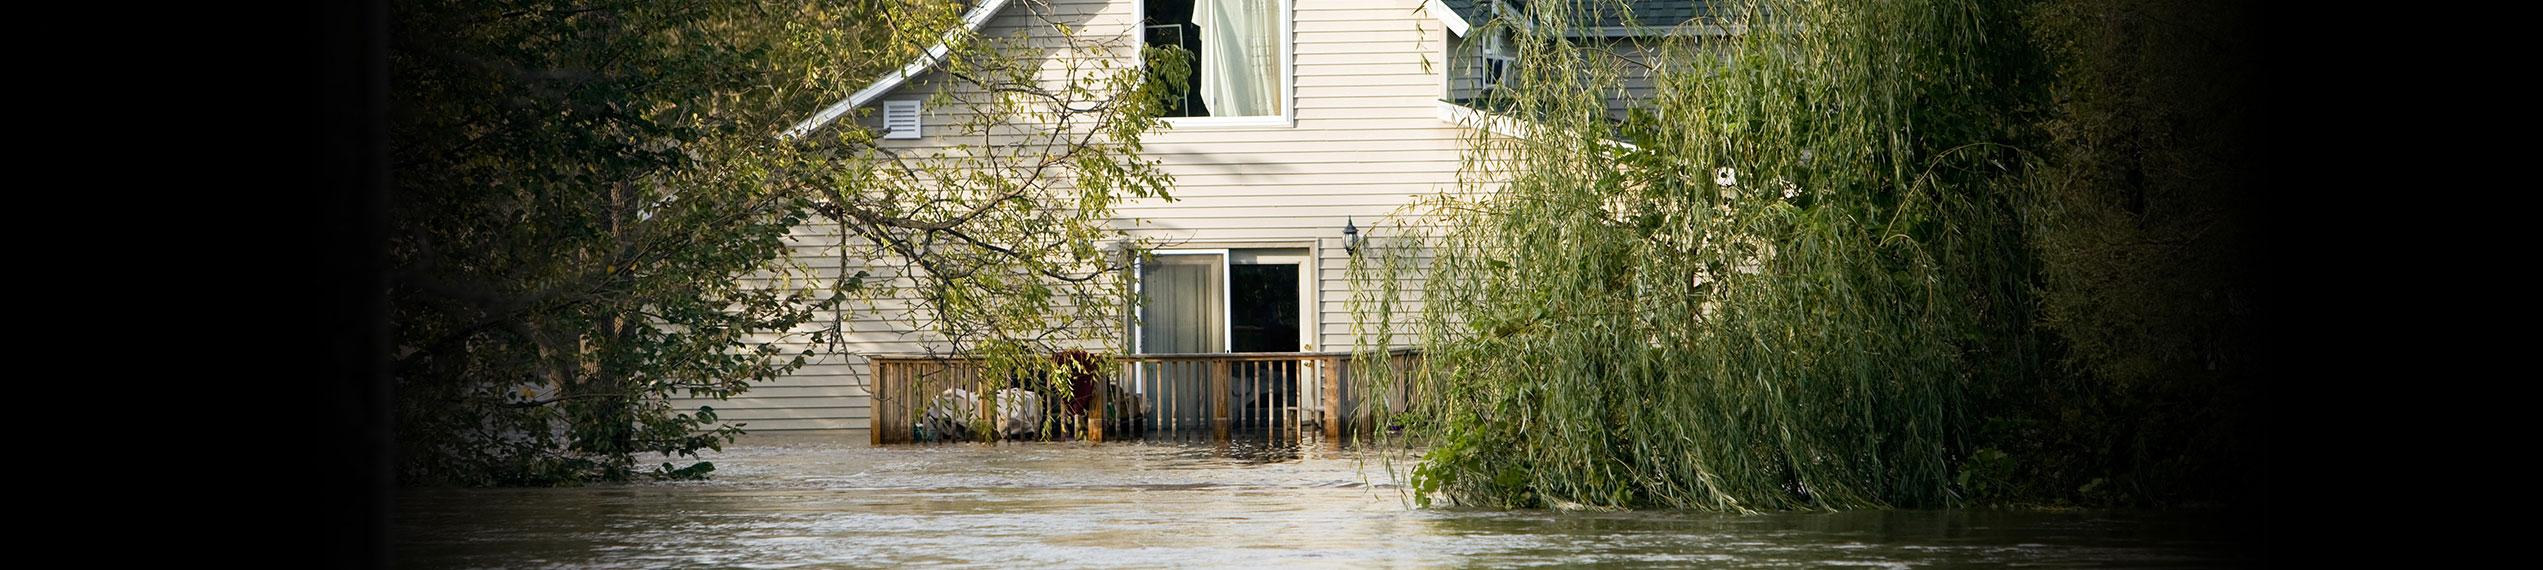 Water damage repair by Paul Davis Restoration of Orlando